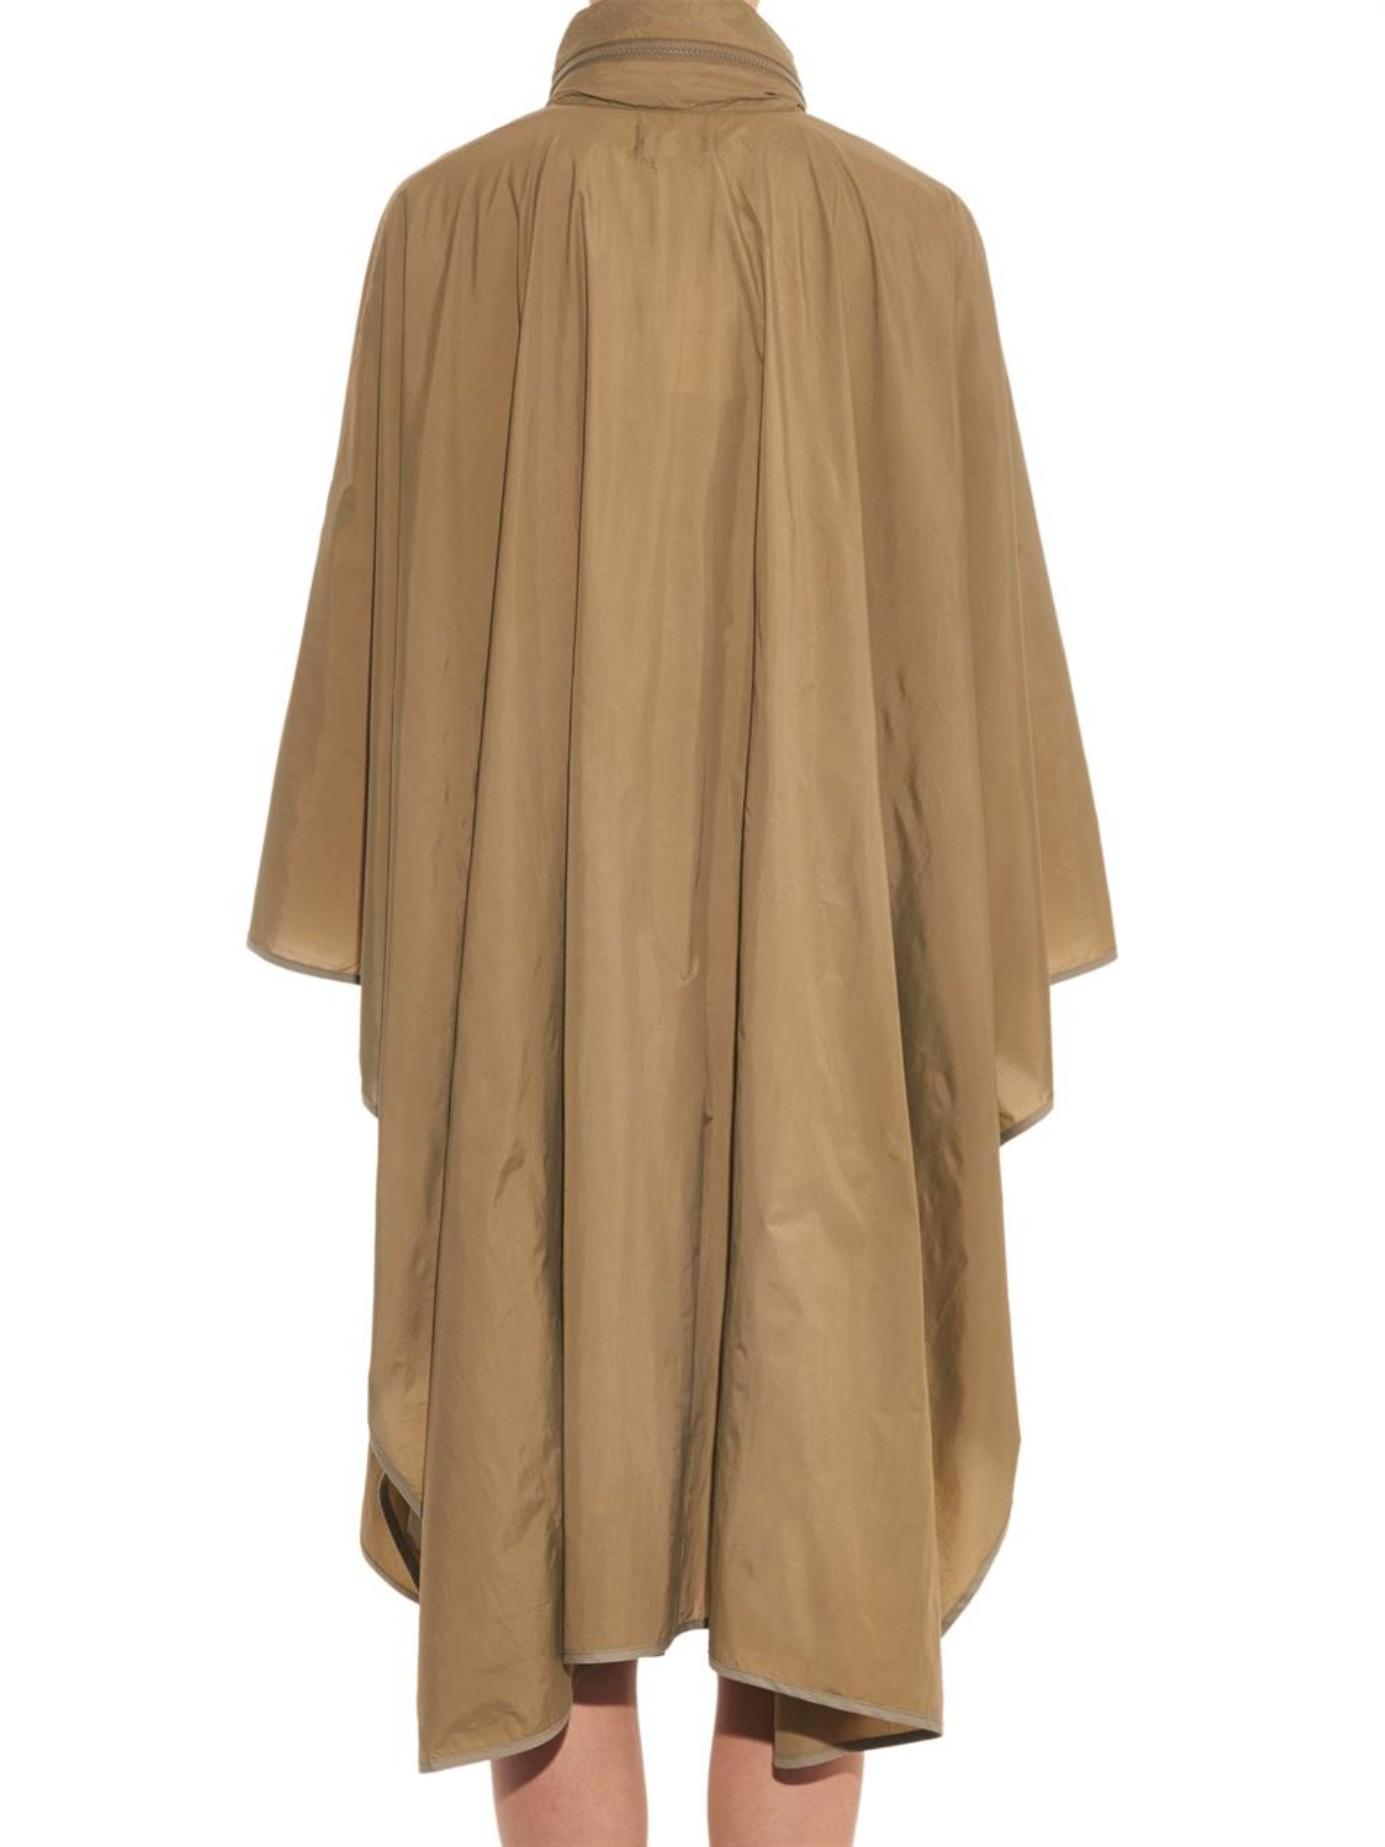 Lyst Isabel Marant Gamble Poncho Raincoat In Natural